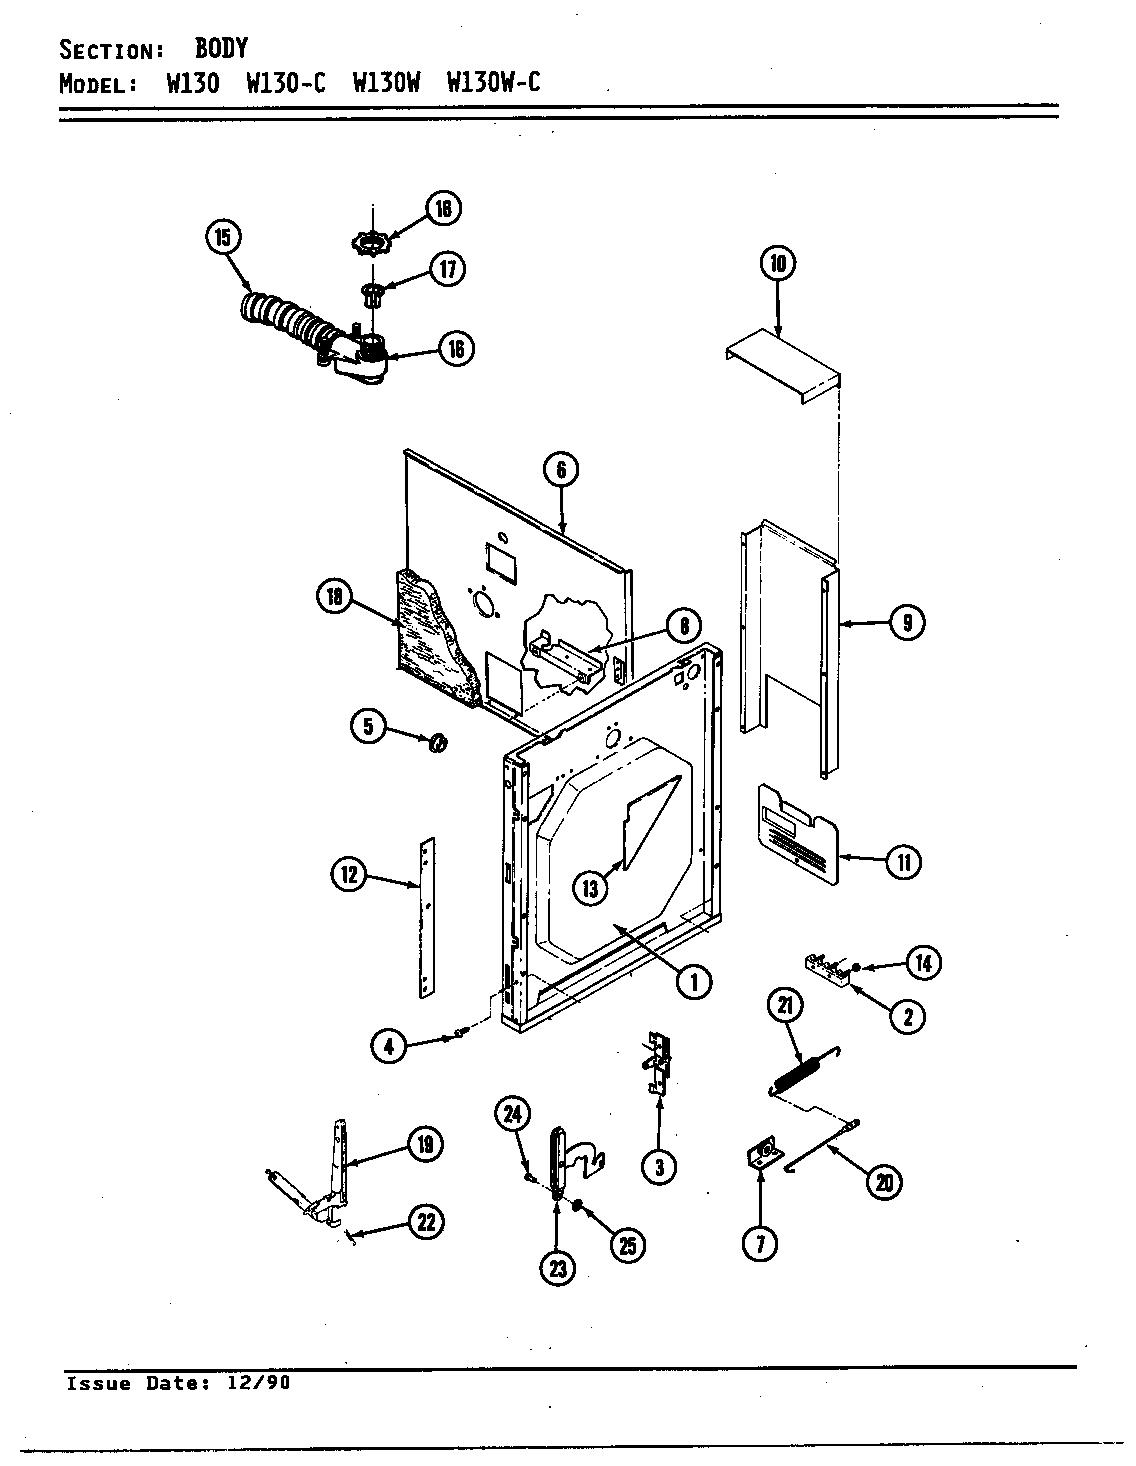 jenn-air w130 wall oven timer